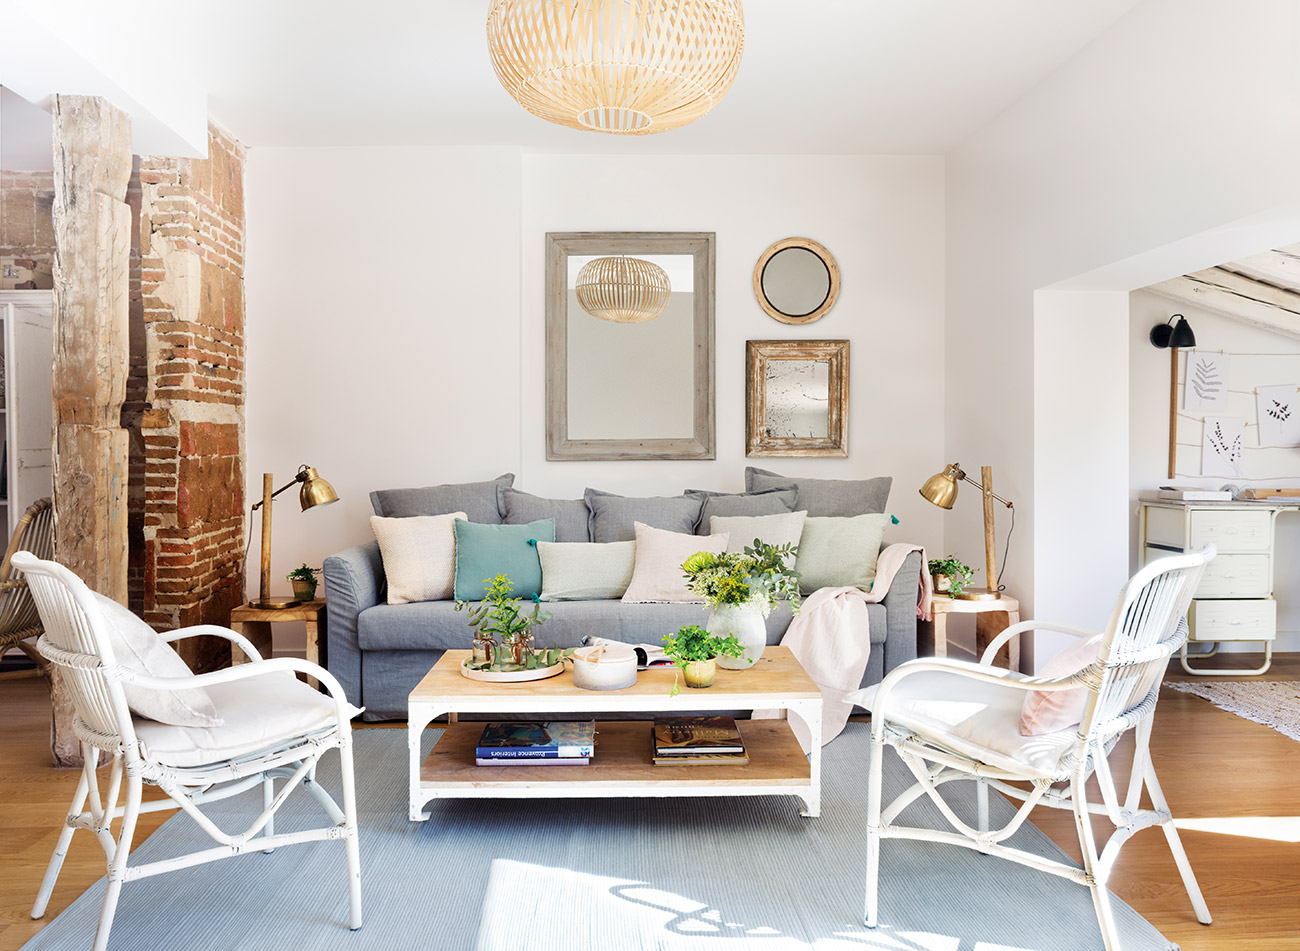 Ideas para aprovechar al m ximo el espacio de un piso peque o for Decoracion de pisos pequenos